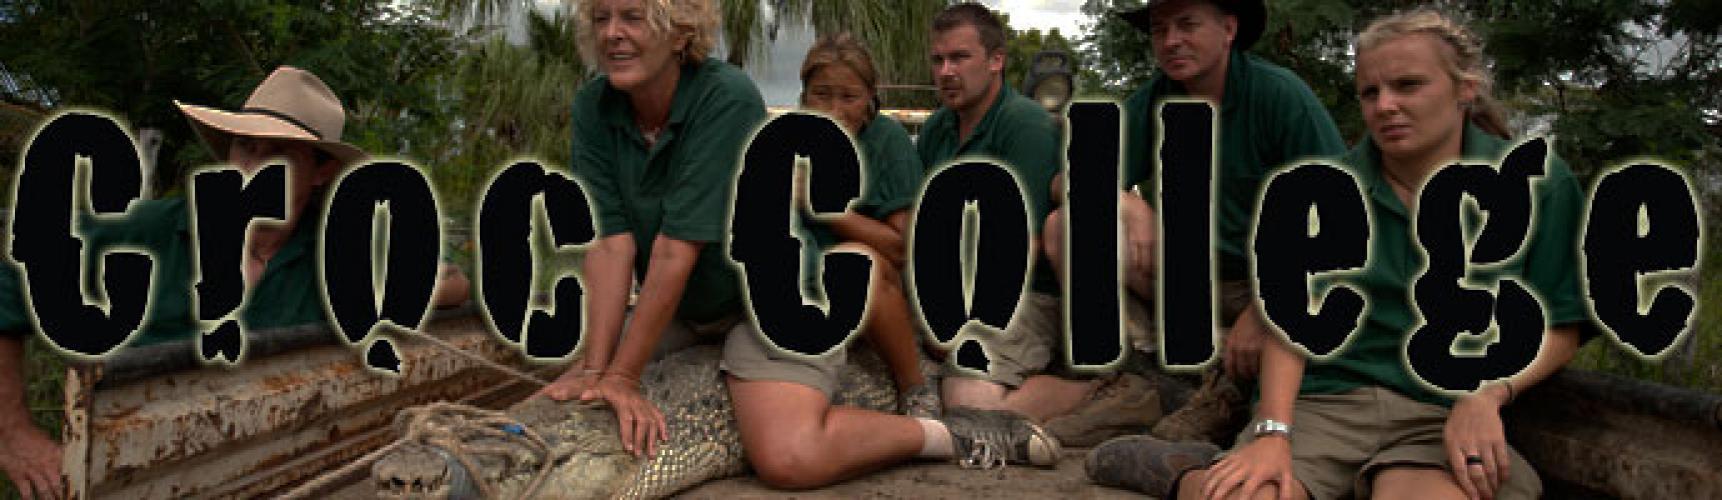 Croc College next episode air date poster